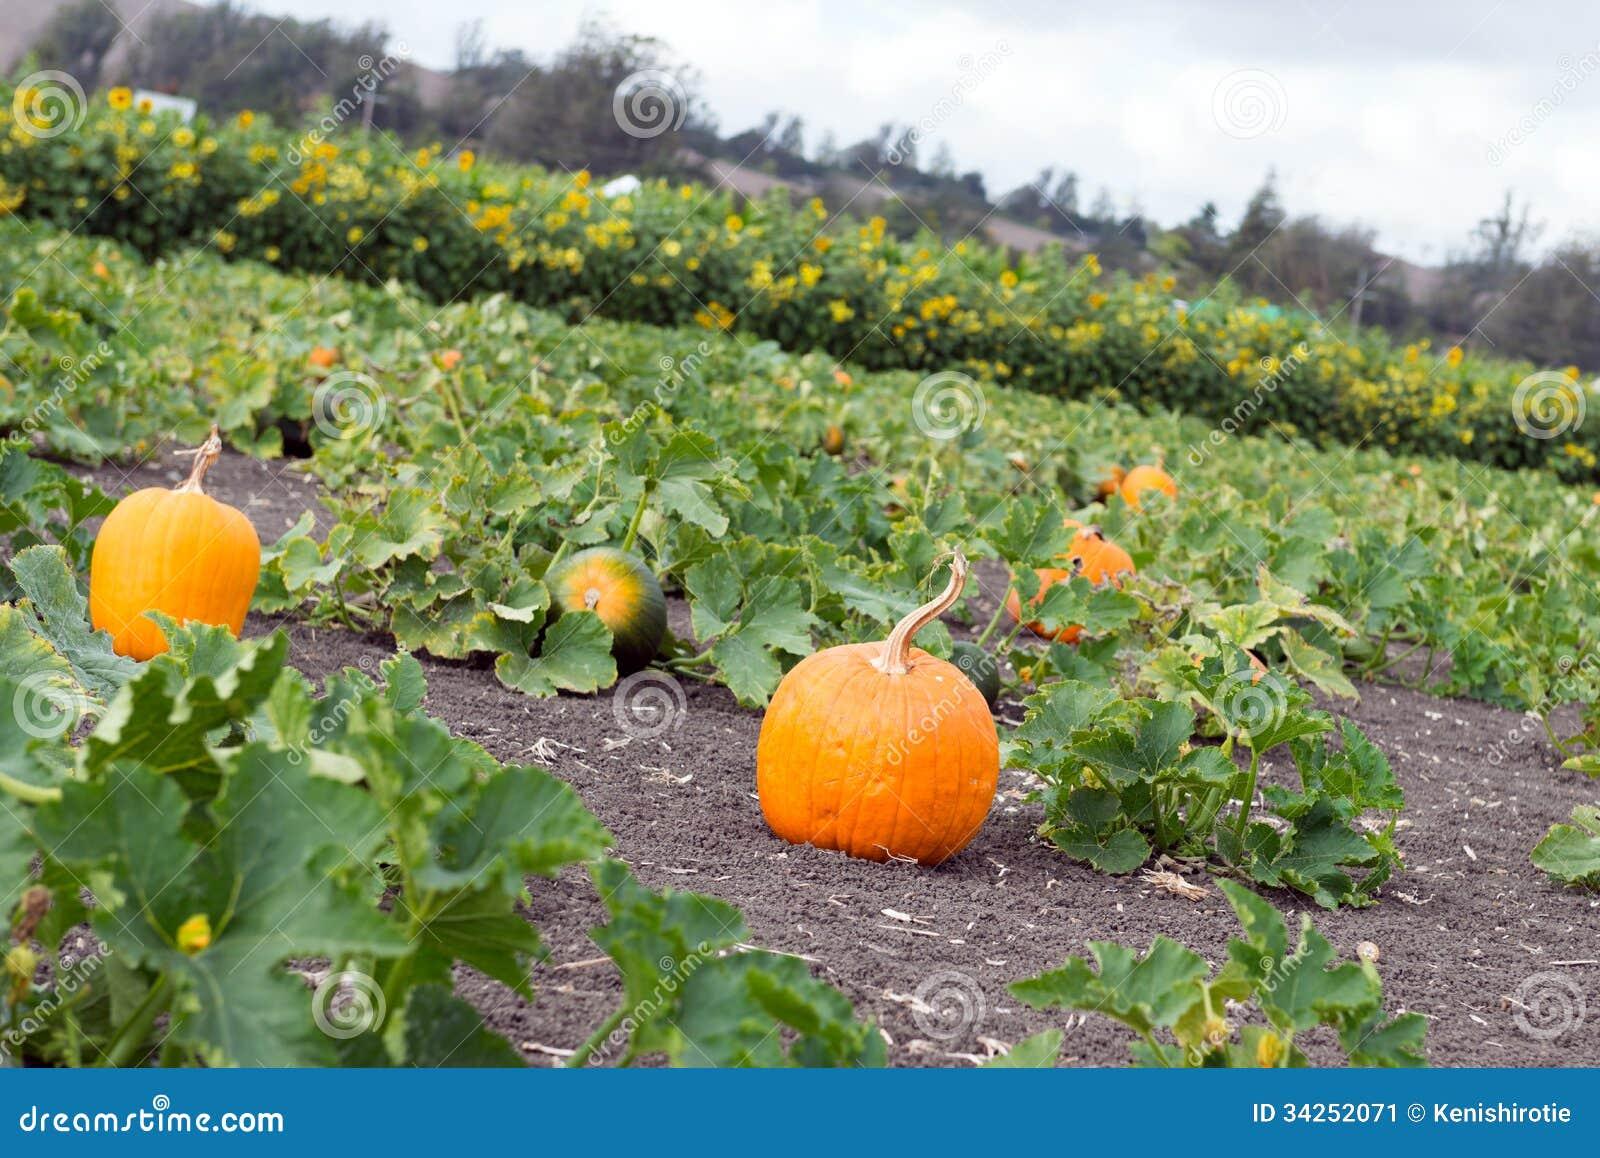 Pumpkin Patch Stock Image. Image Of October, Harvesting